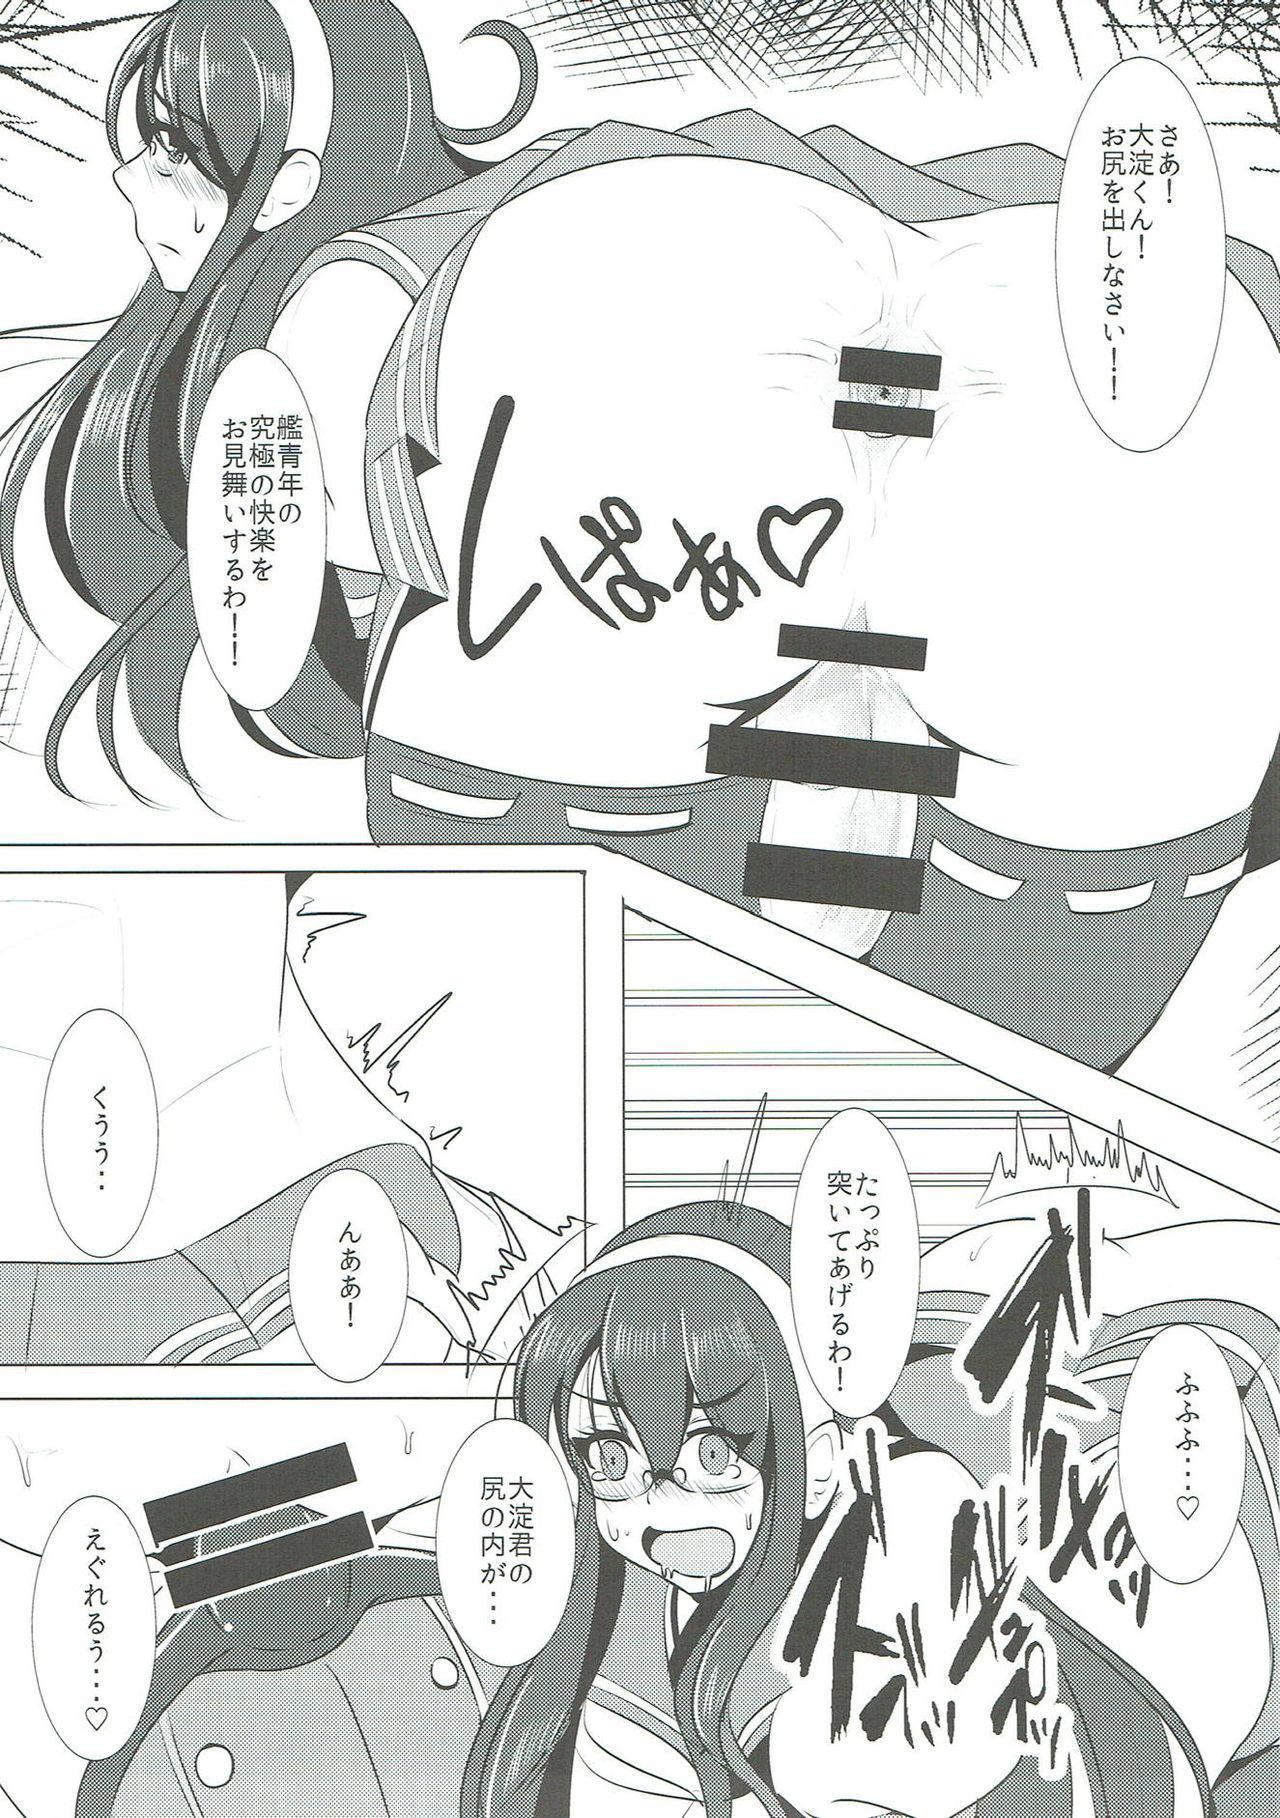 Teitoku Kanmusu Ooyodo-kun Man of Fleet girl 15